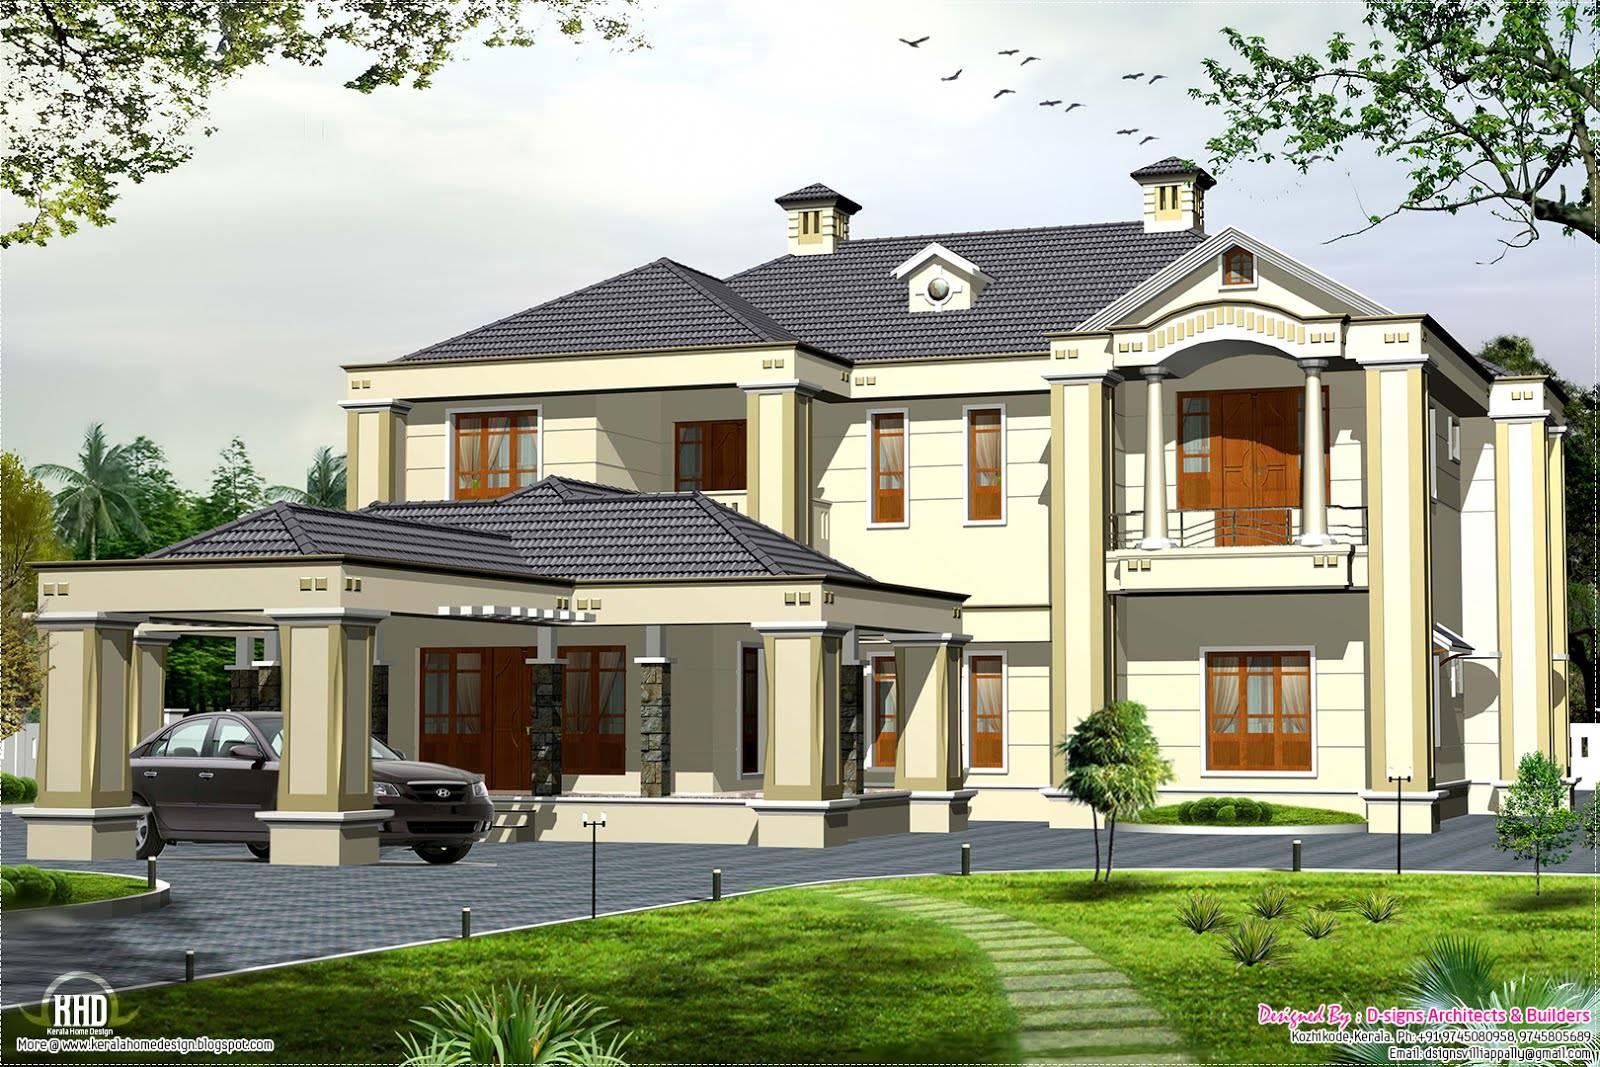 House design names - House Style Names